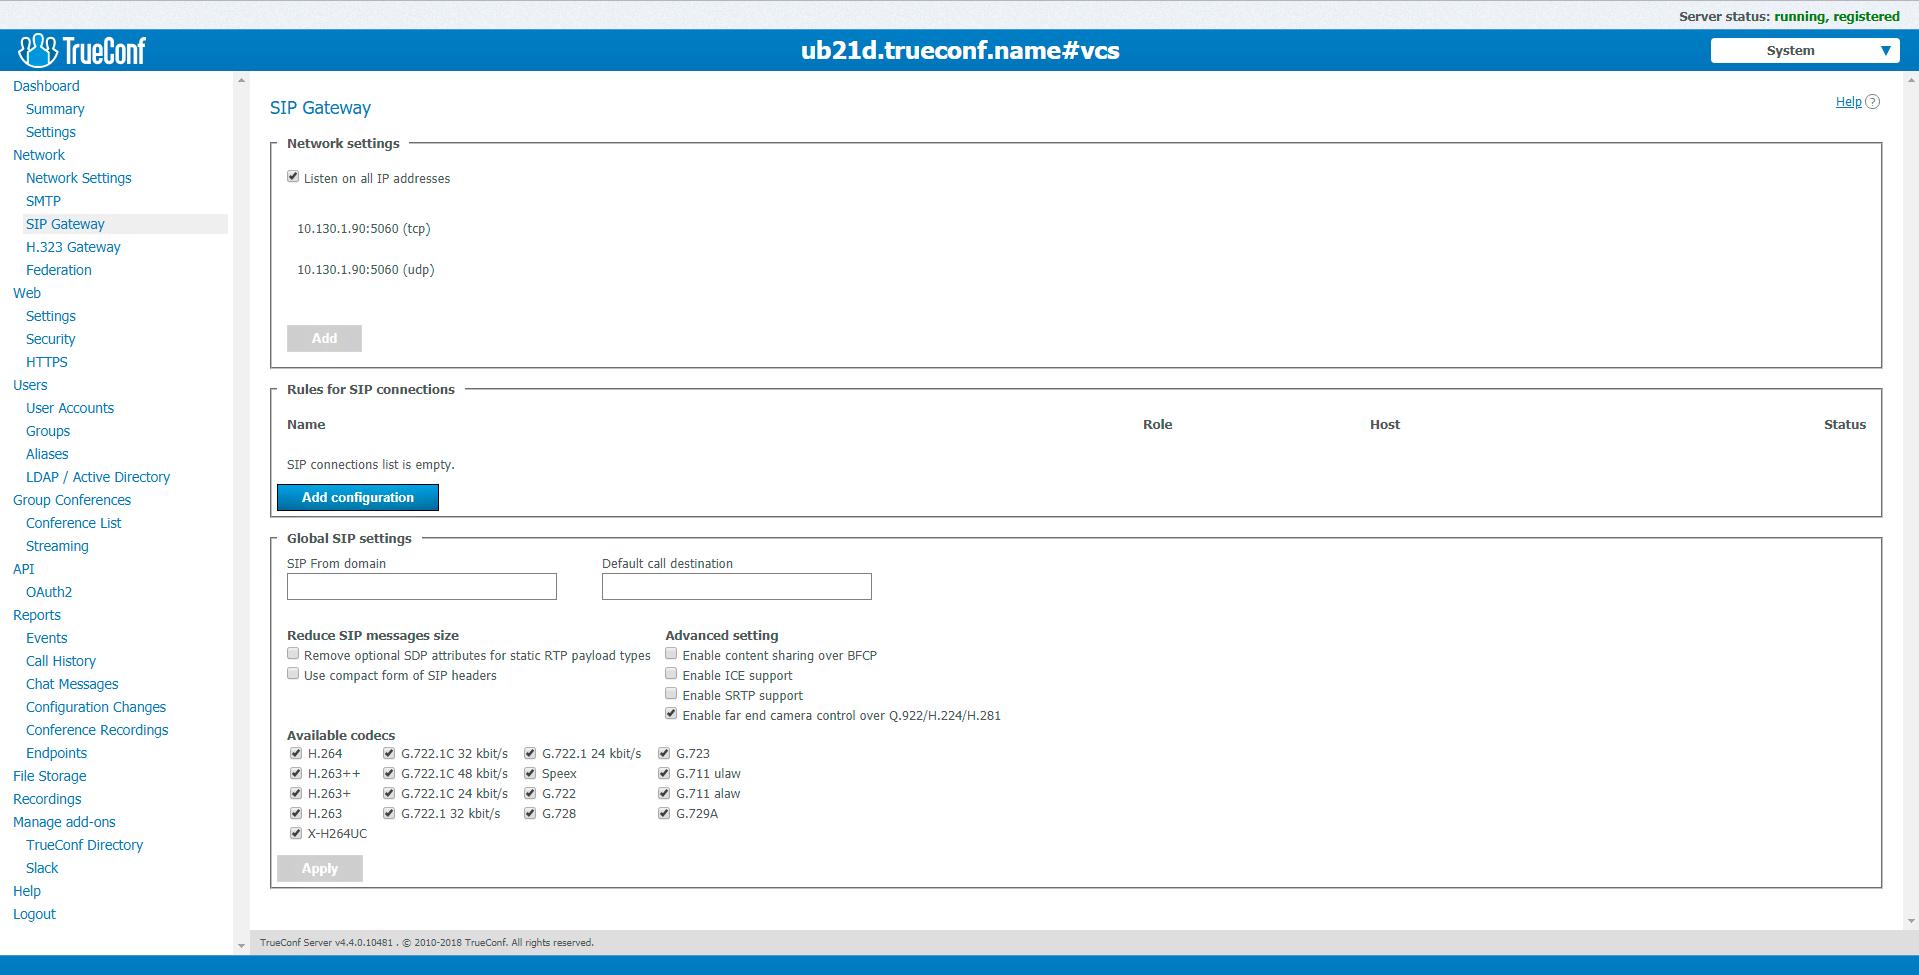 client application TrueConf for Windows